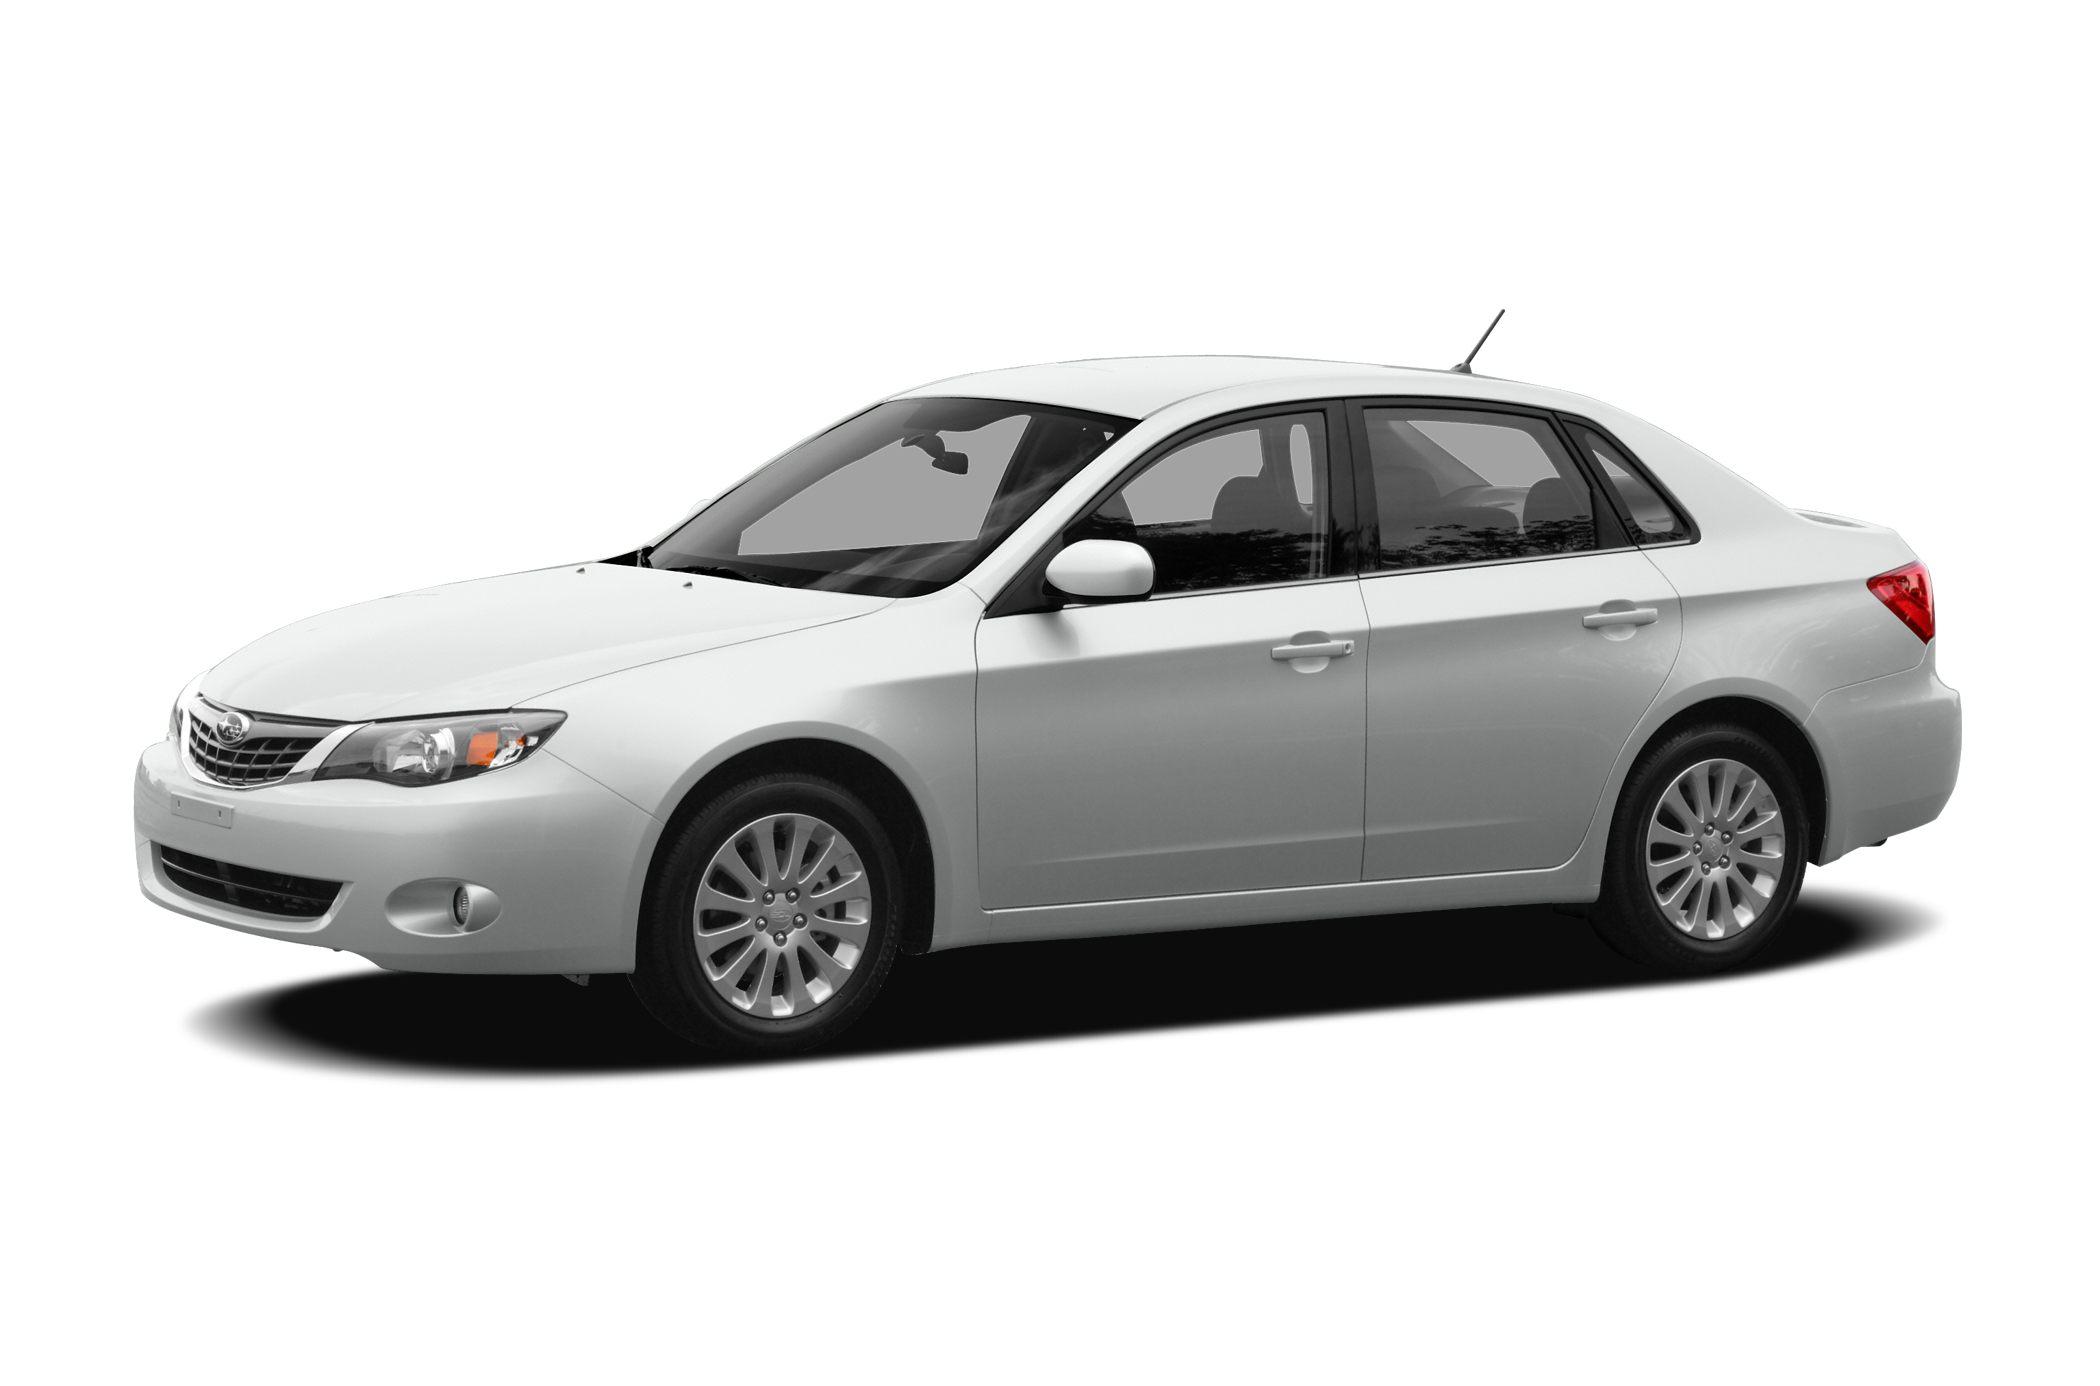 2010 Subaru Impreza 25i CARFAX 1-Owner LOW MILES - 54038 PRICED TO MOVE 600 below Kelley Blue